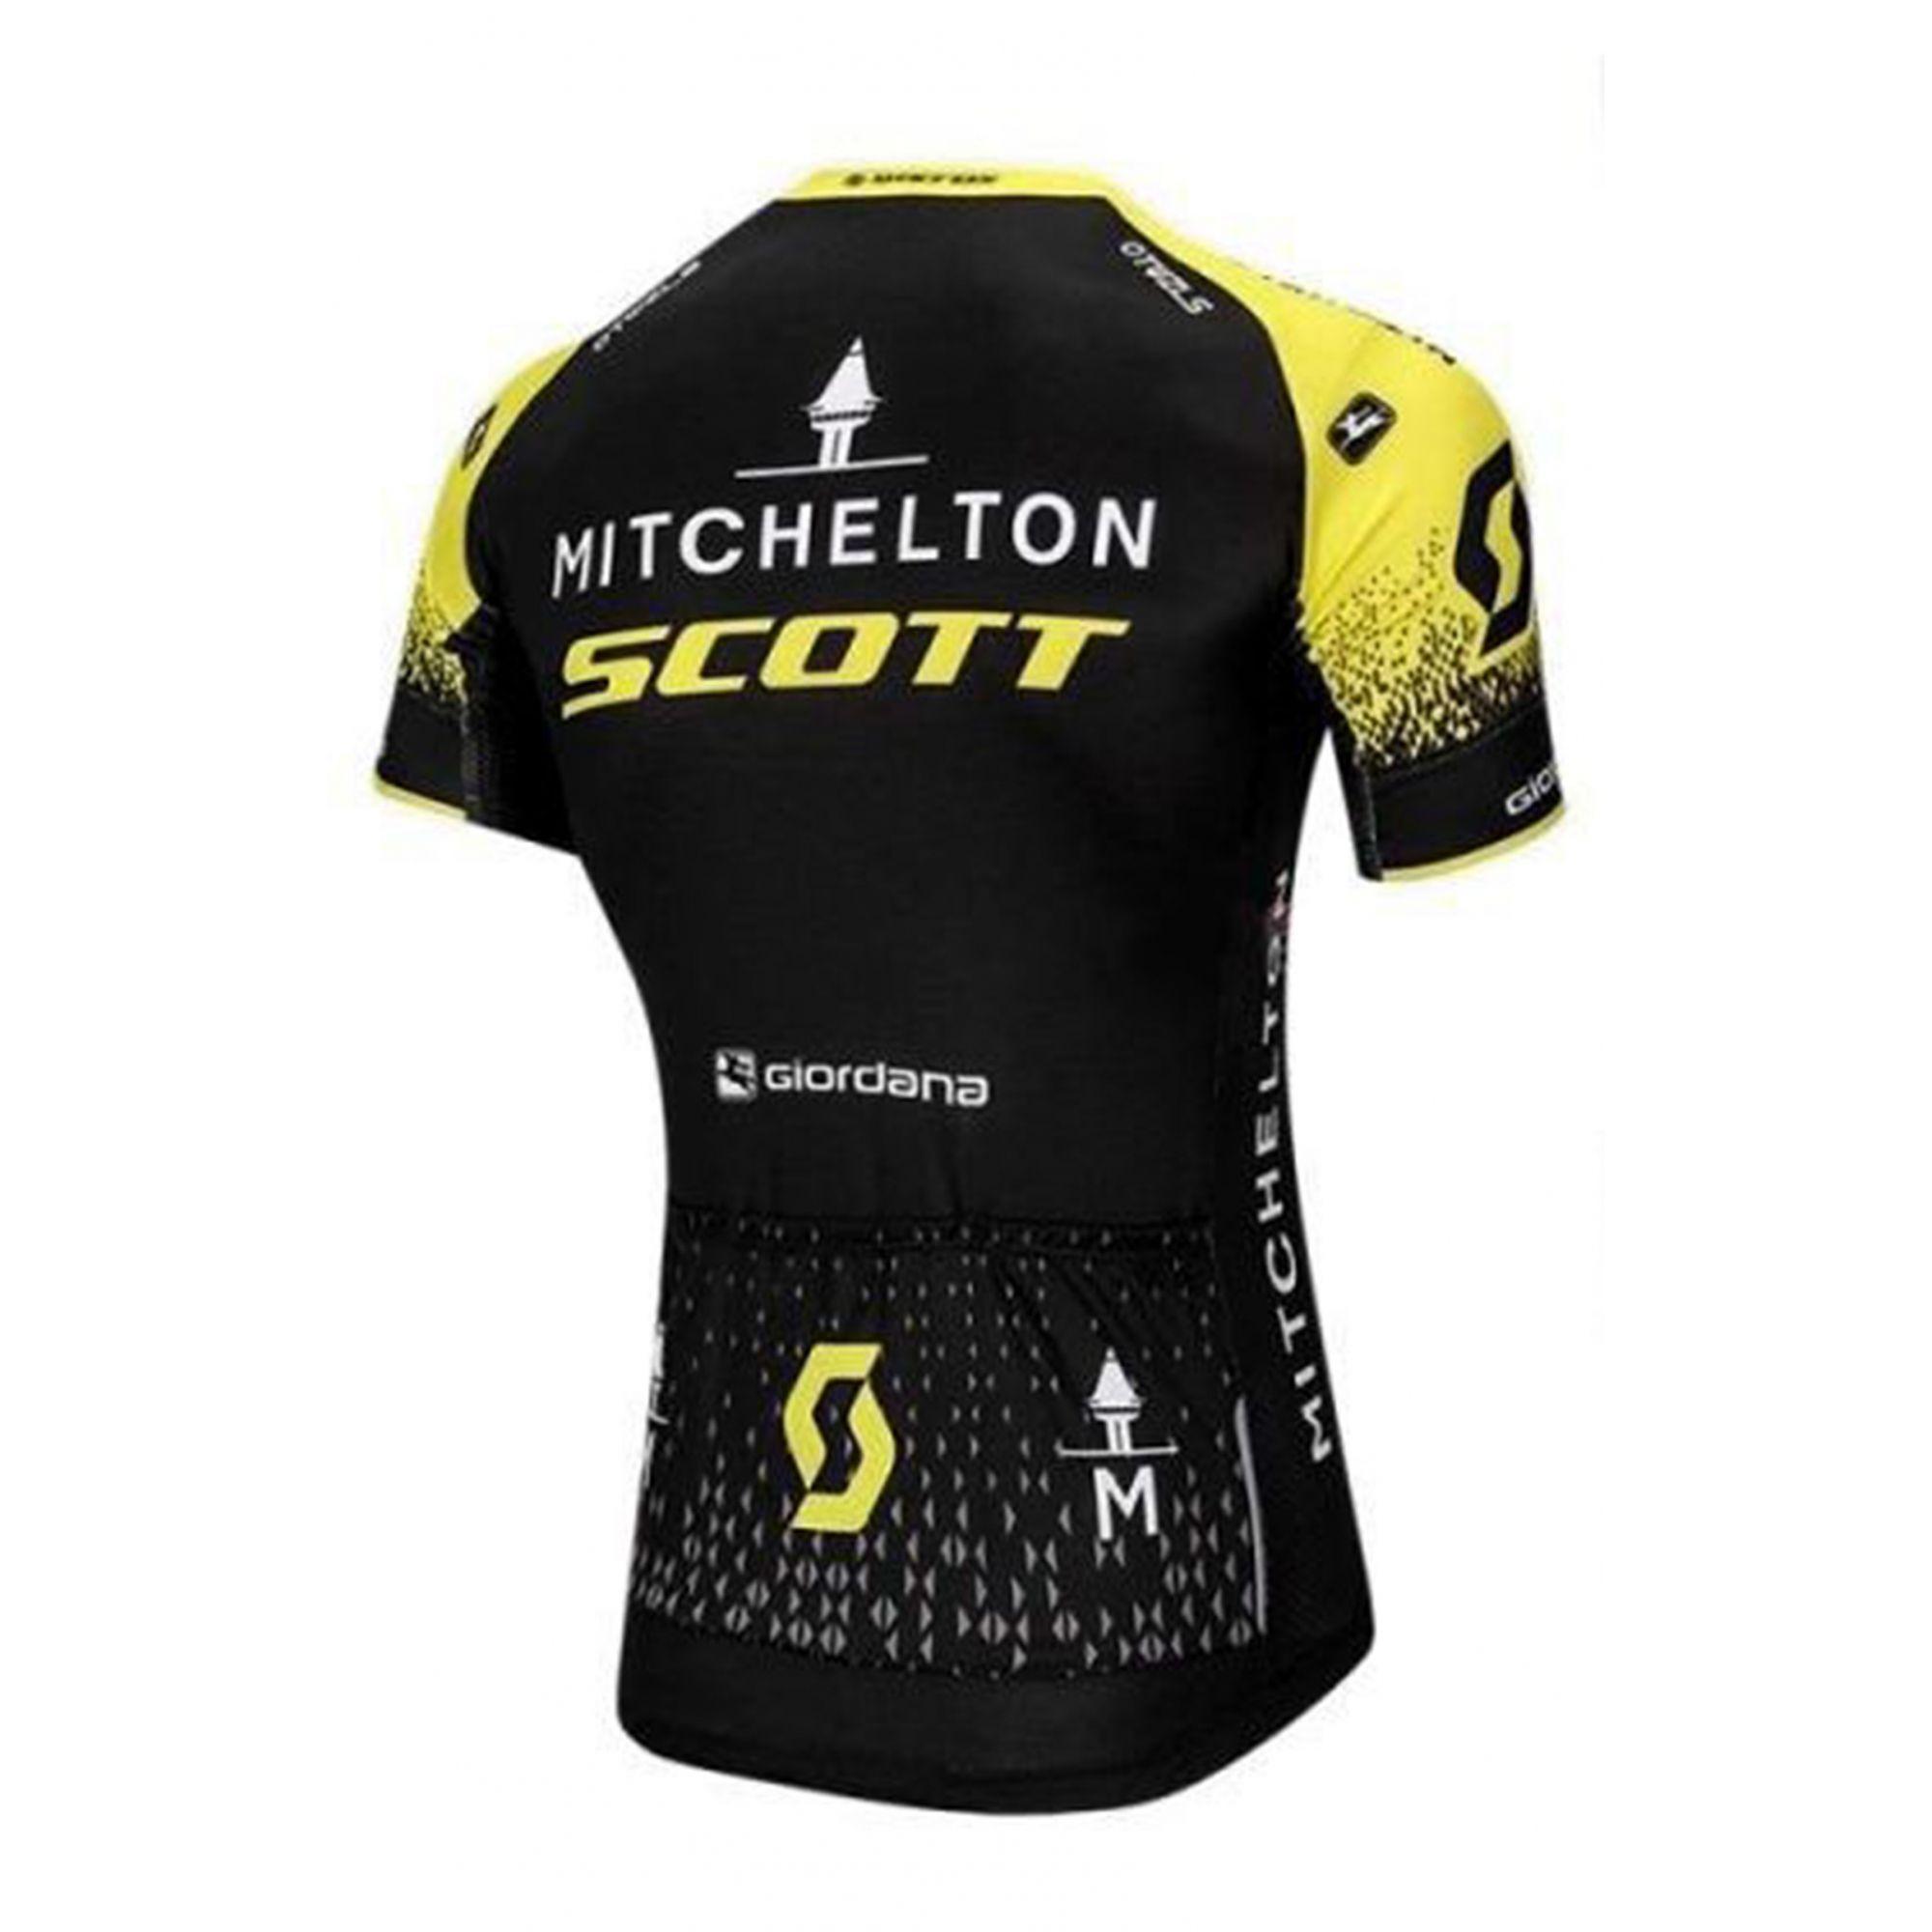 Camisa Scott Mitchelton Proteção UV - Refactor